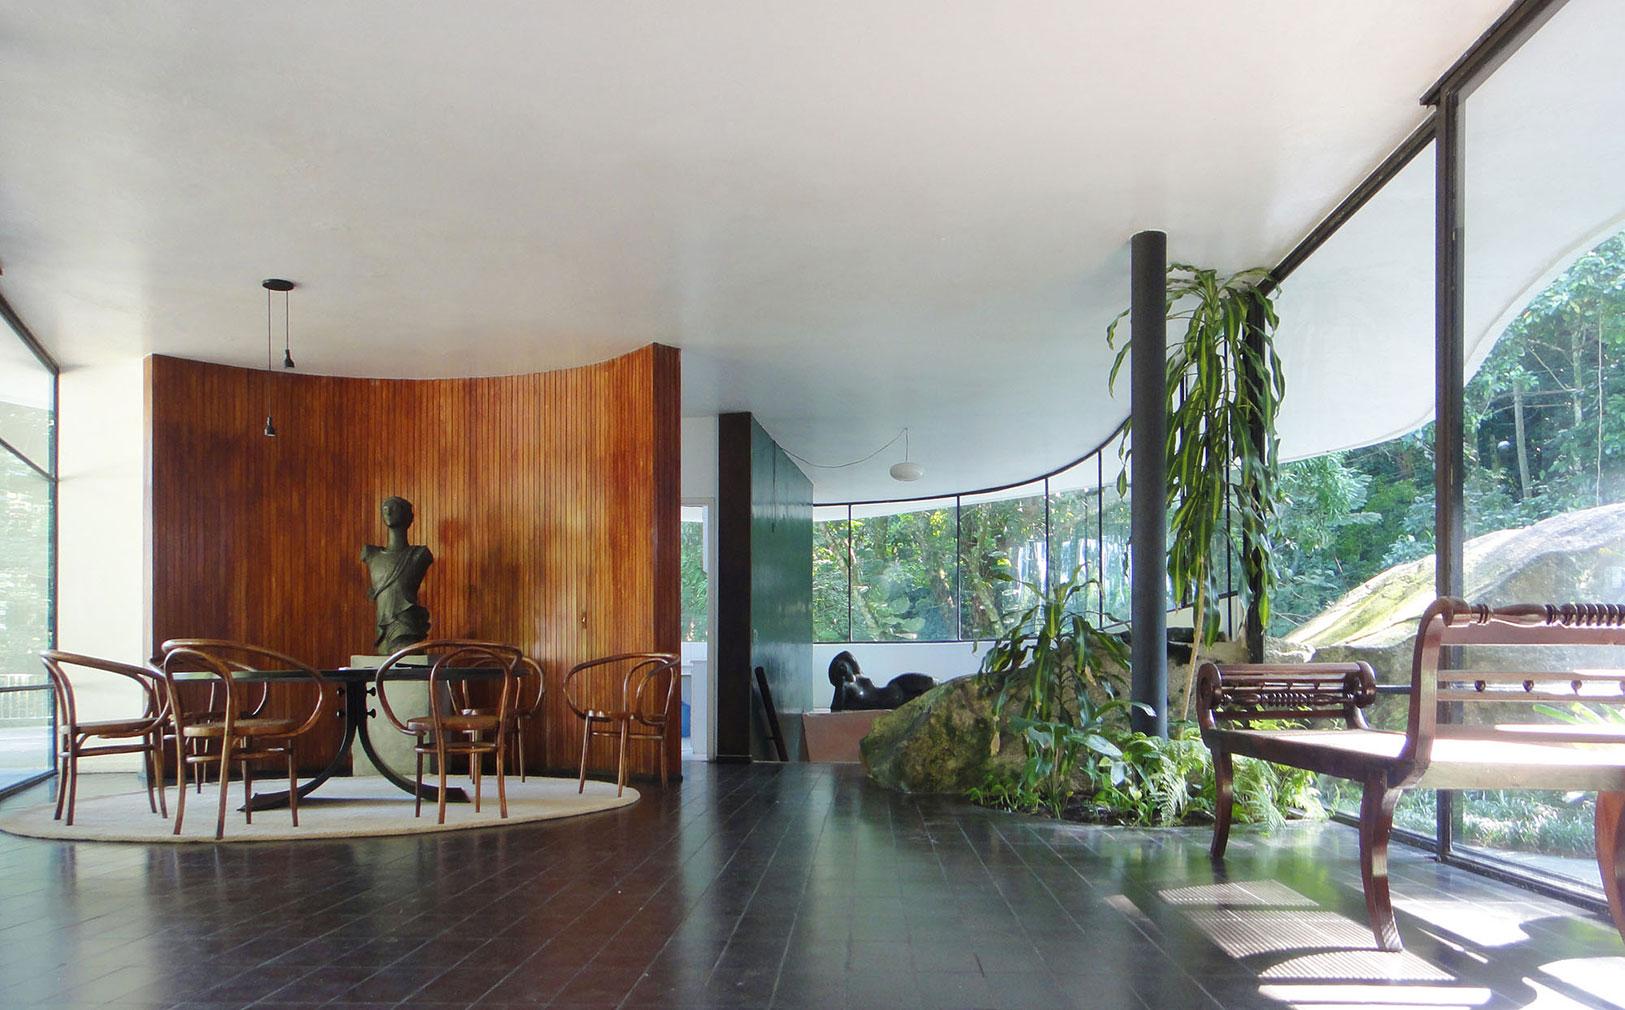 Architects' homes you can visit including Oscar Niemeyer's Casa Das Canoas